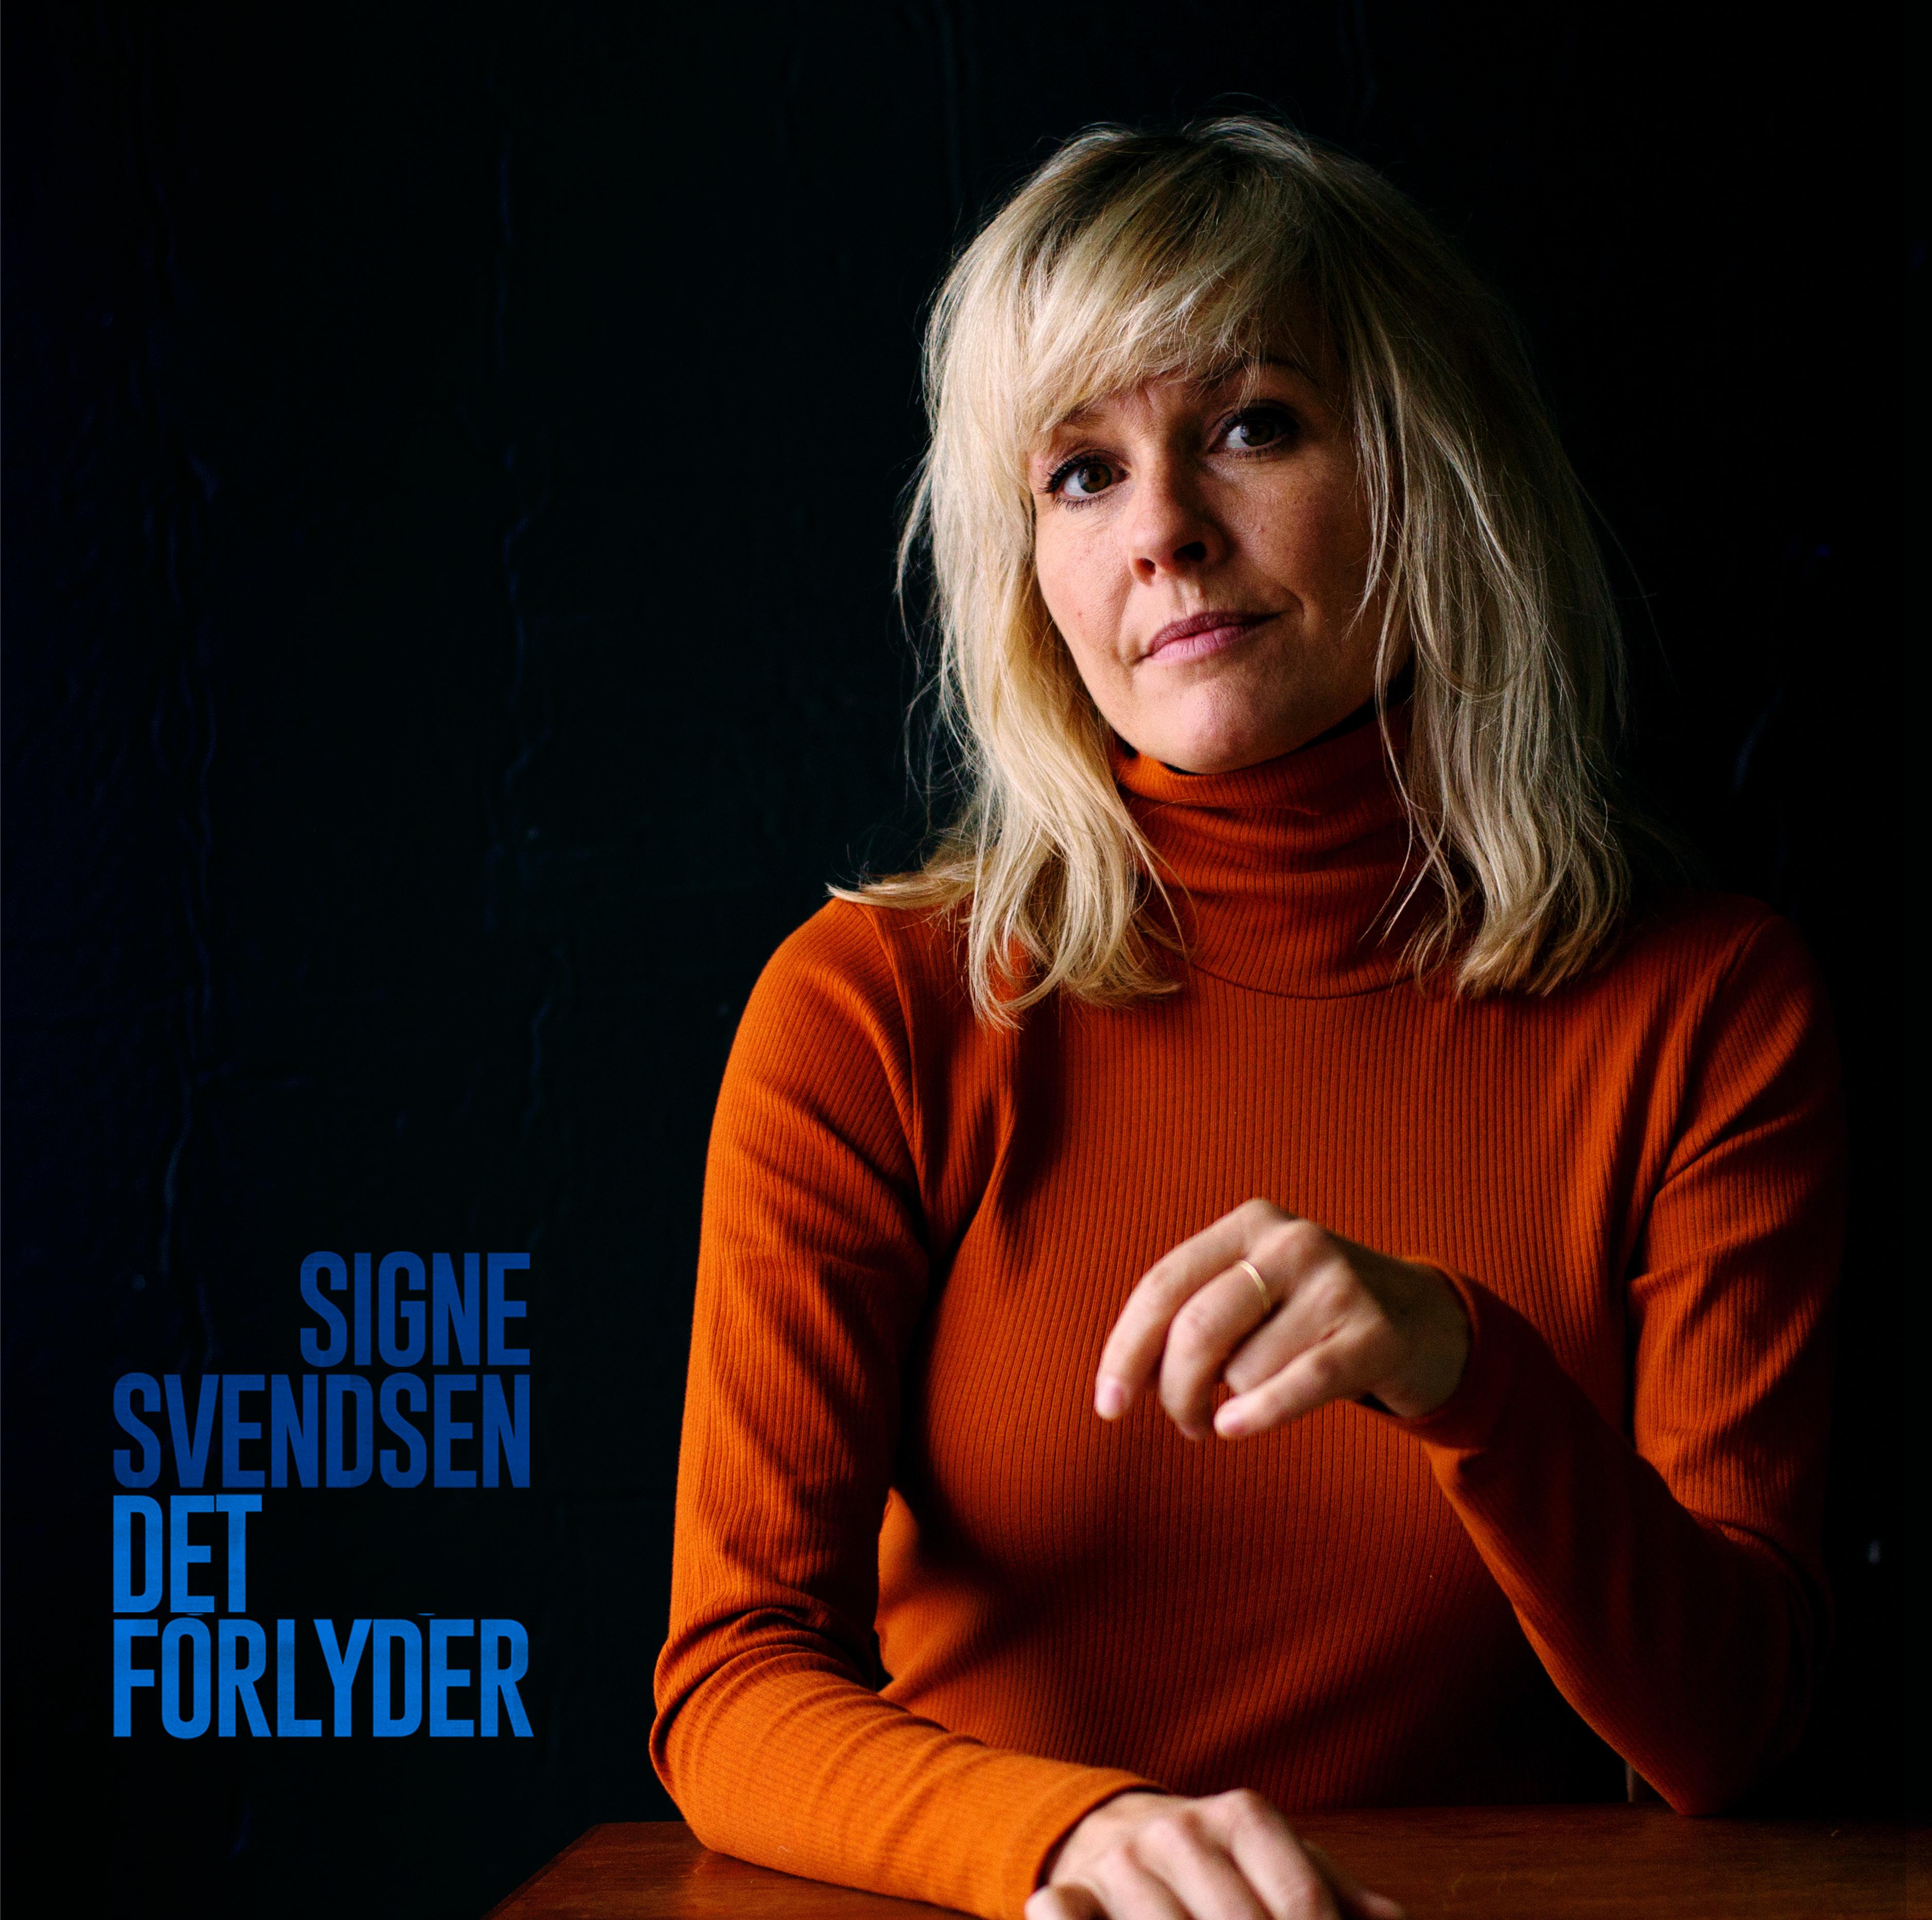 Det Forlyder - Signe Svendsen - Musik - I Do Records - 5707785011324 - 31/1-2020